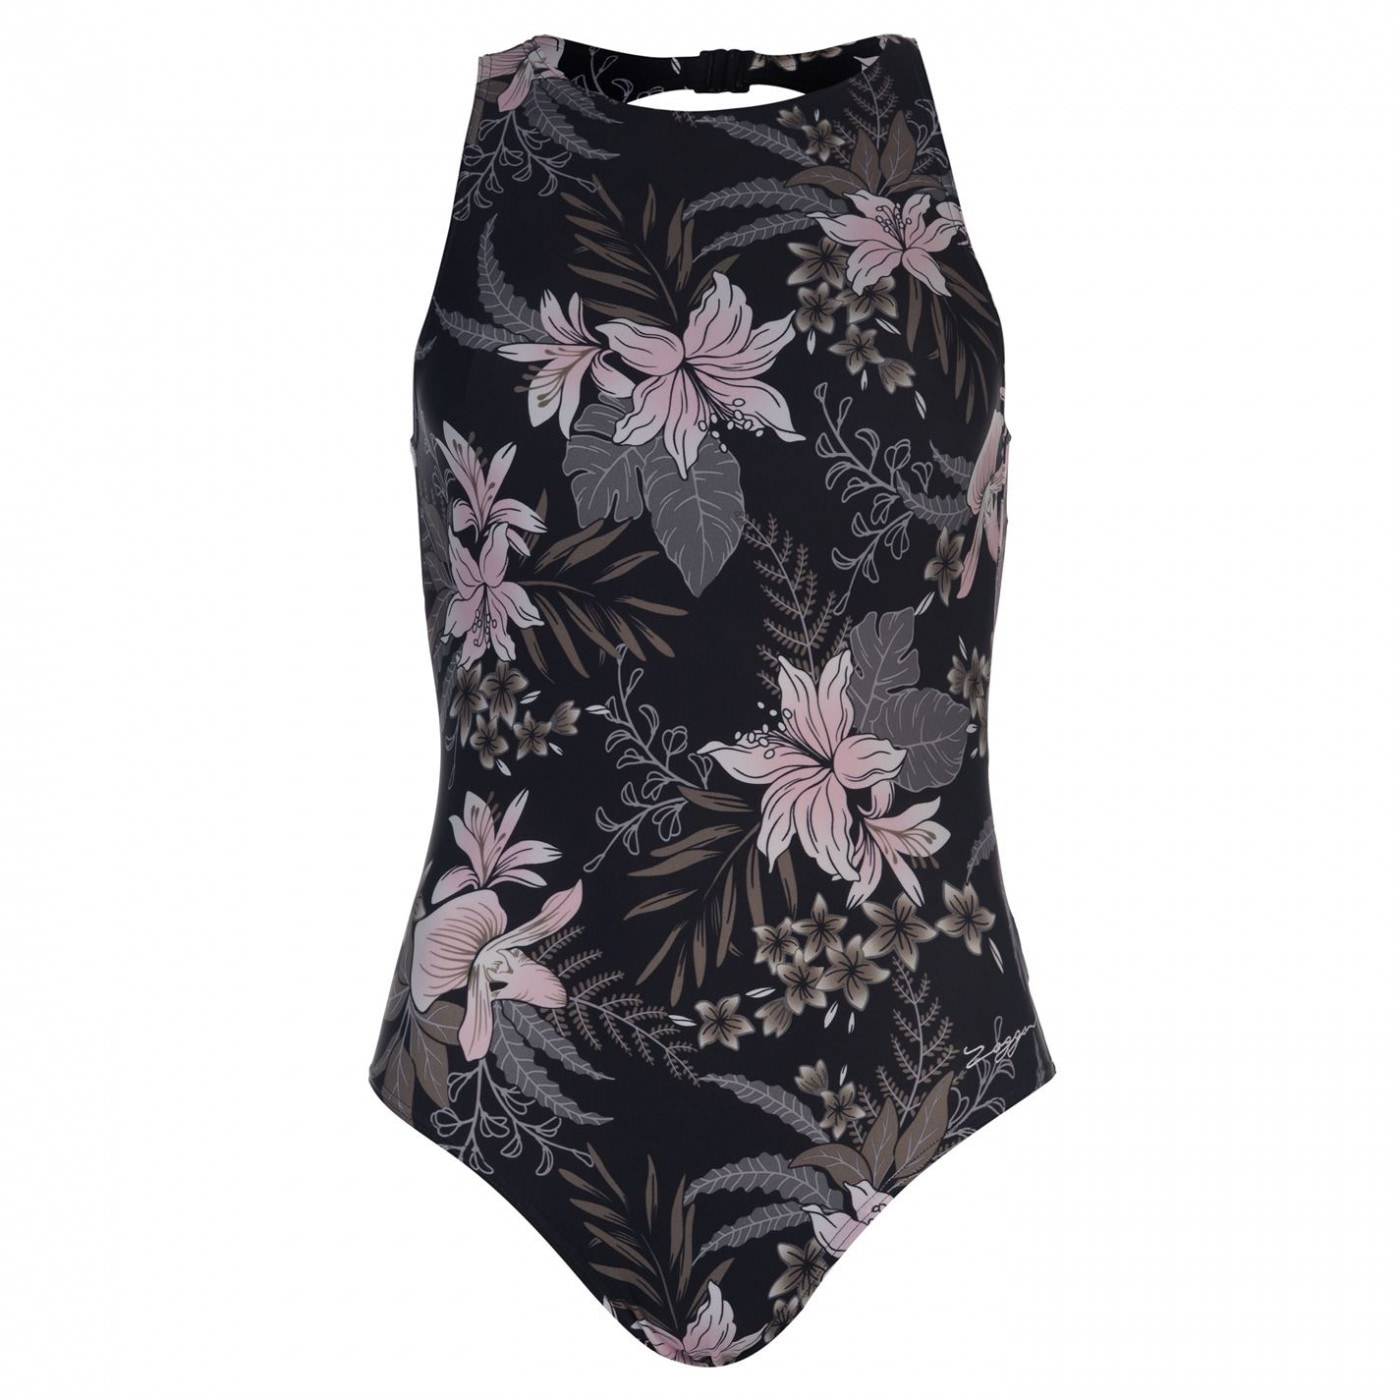 Zoggs Soft Nature Hi Front Swimsuit Ladies